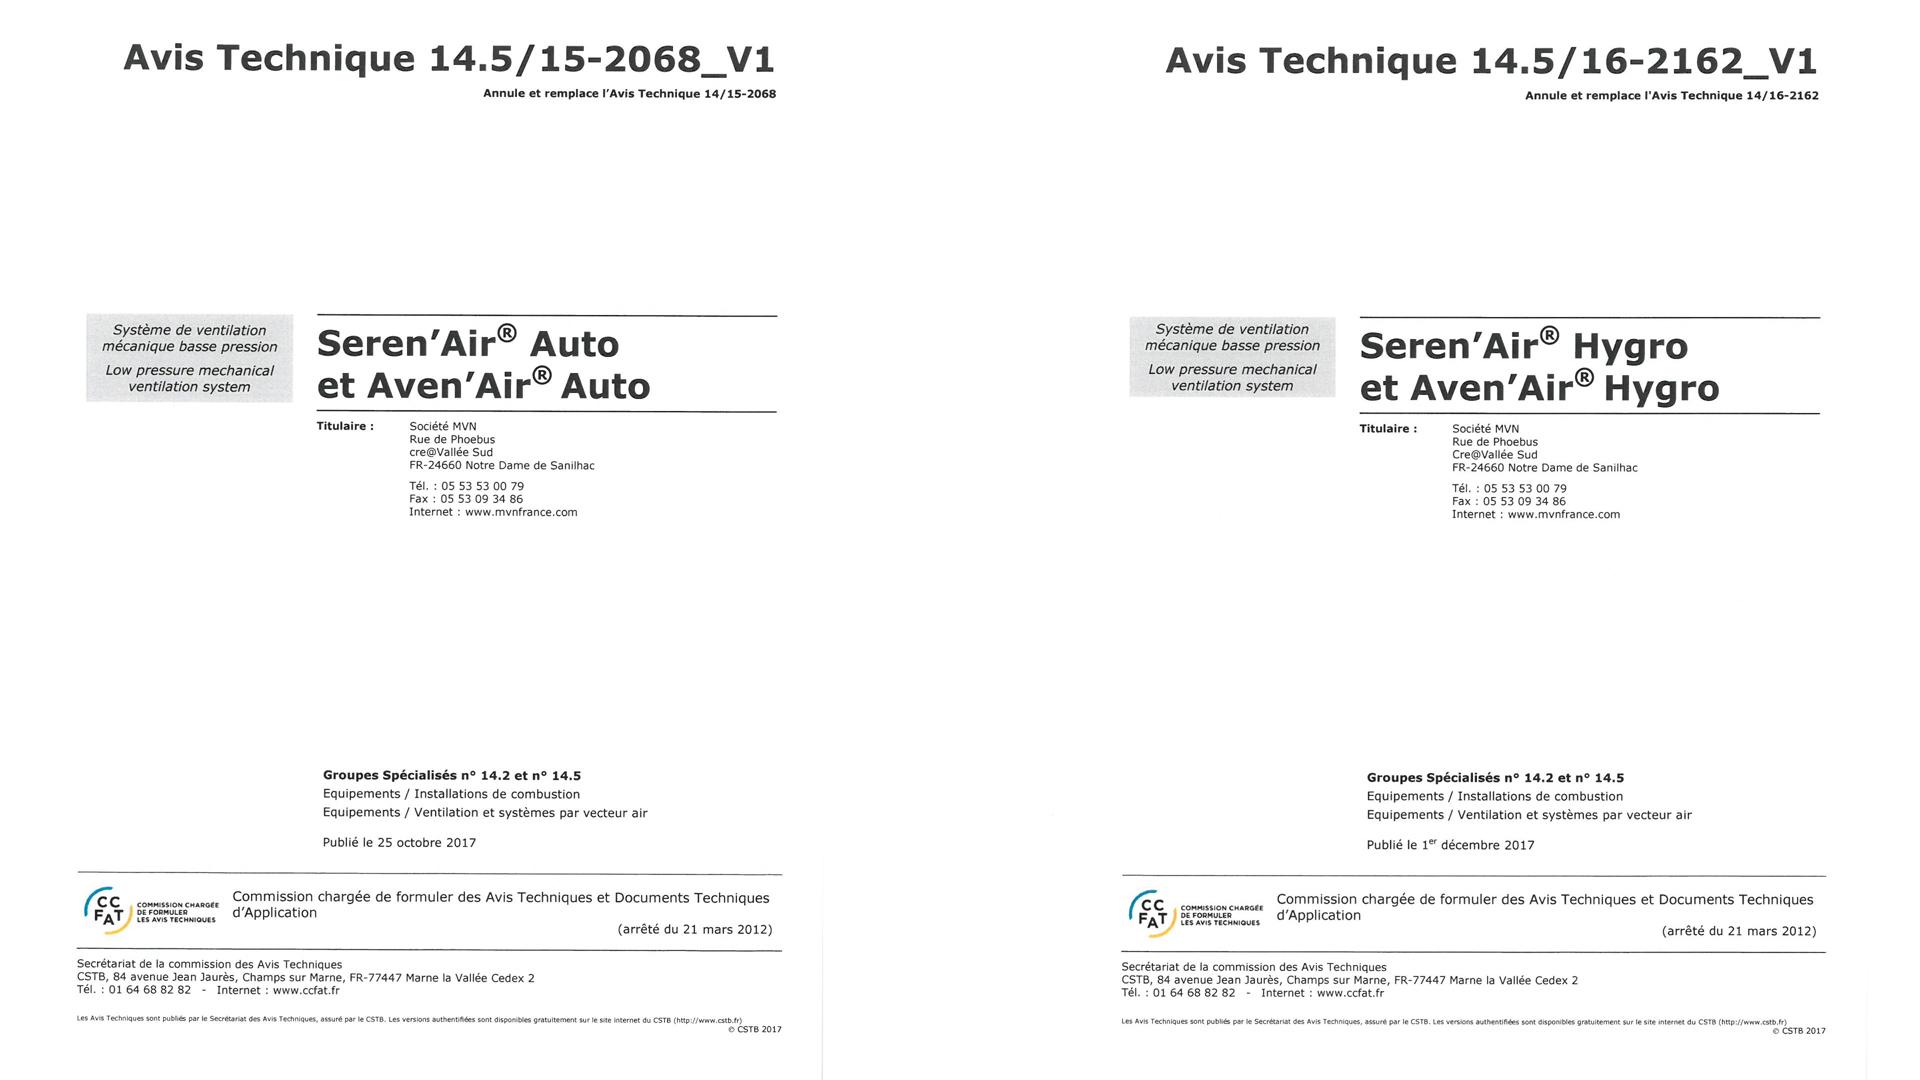 Avis technique auto 14.5/15-2068_V1 et Avis technique Hygro 14.5/16-2162_V1